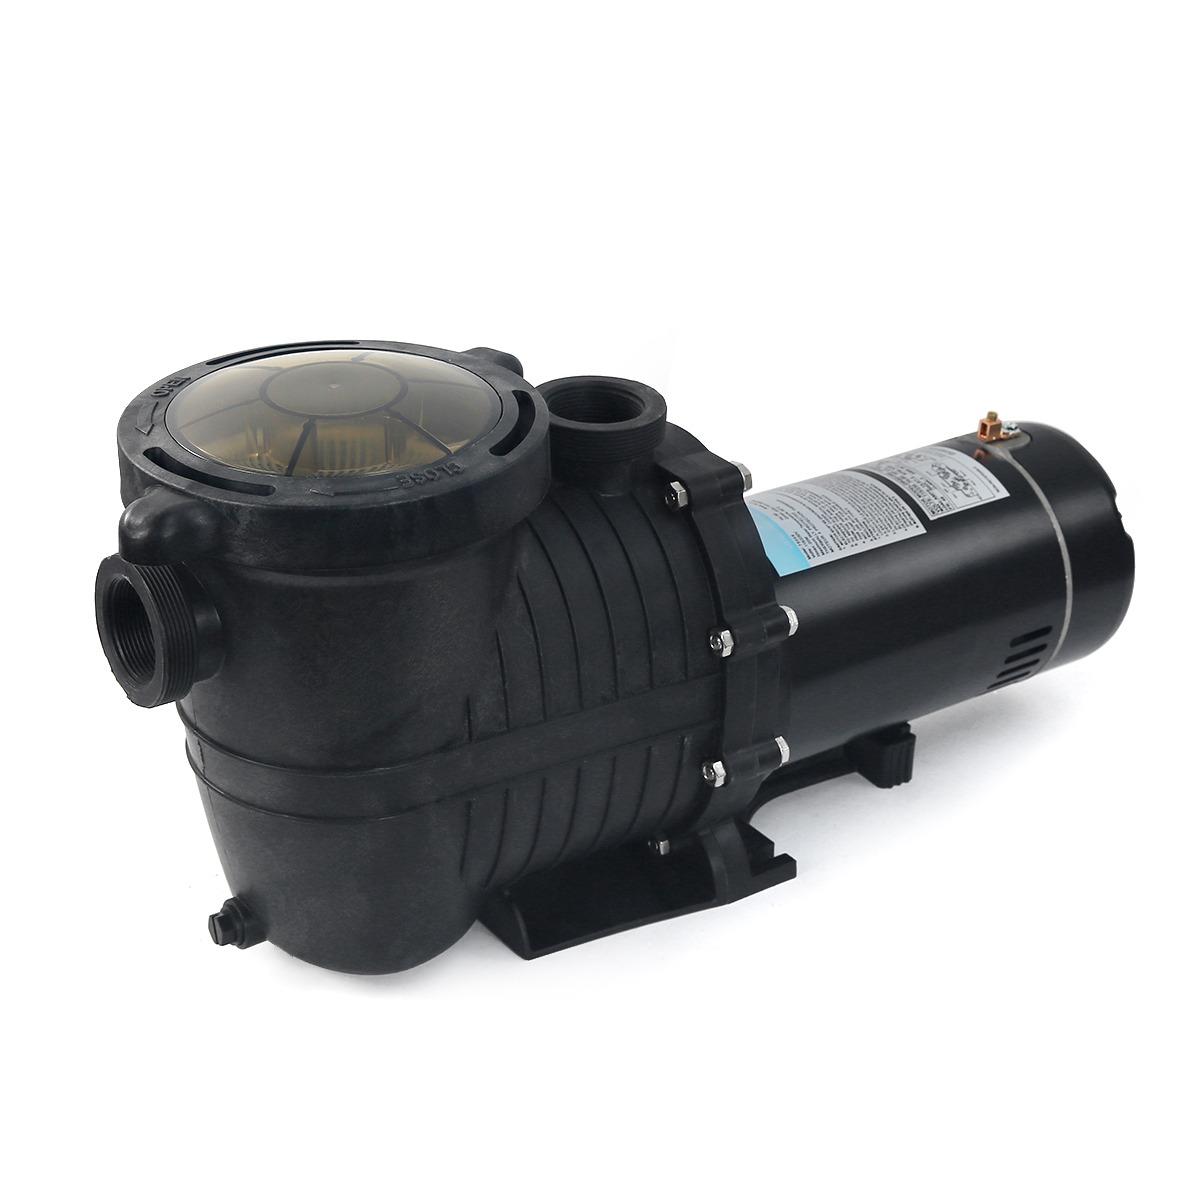 1 5hp in ground swimming spa pool pump motor strainer - Salt water pumps for swimming pools ...